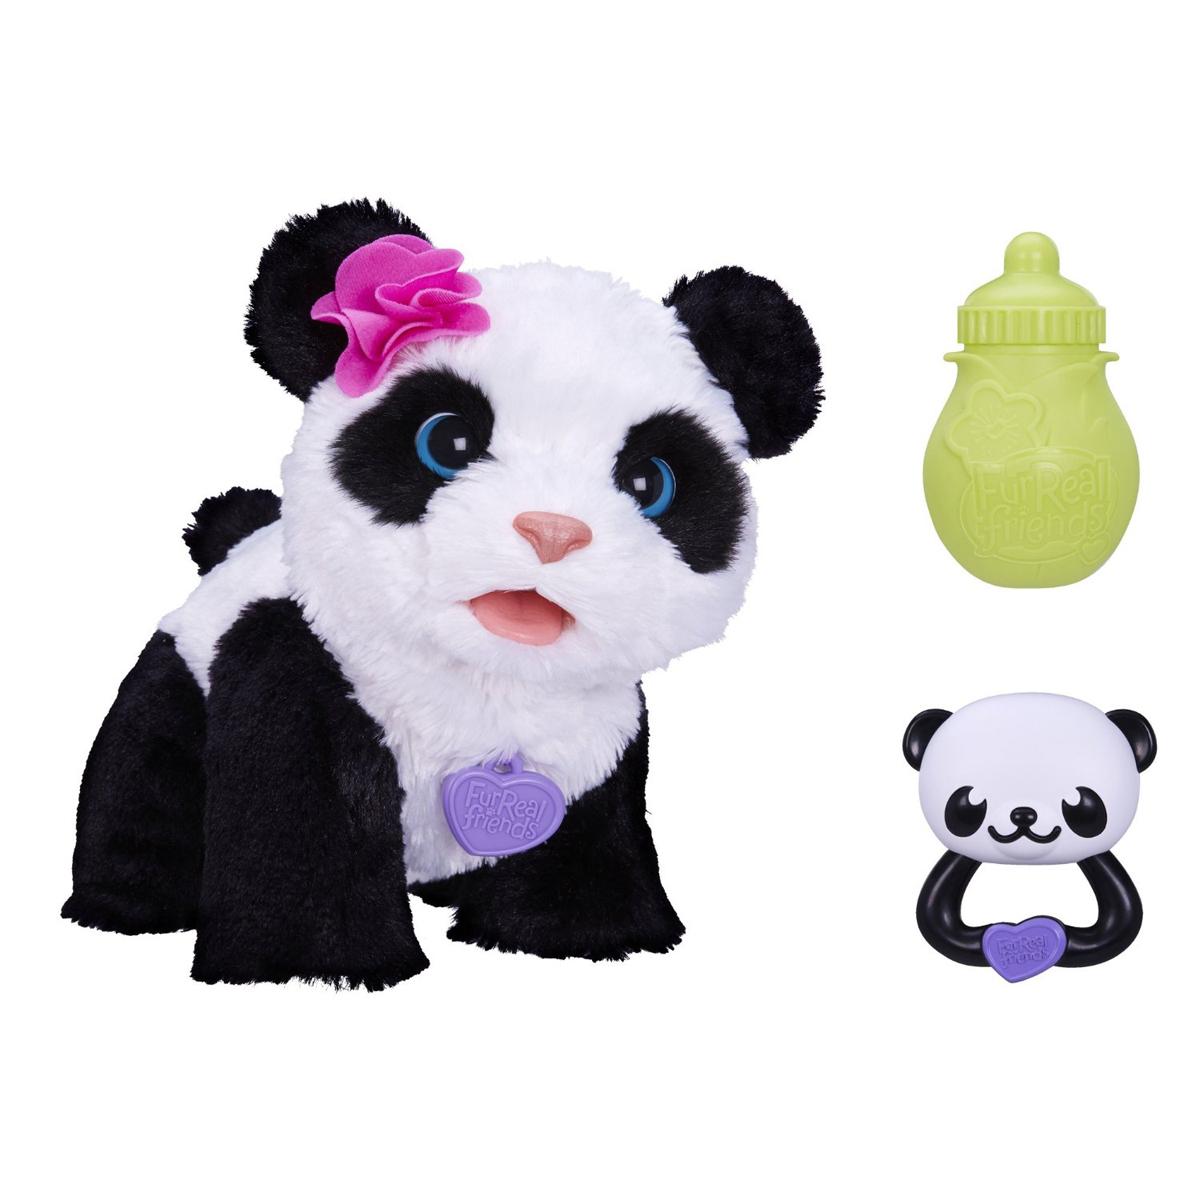 Интерактивная игрушка Малыш Панда, серия FurRealFrendsИнтерактив для малышей<br>Интерактивная игрушка Малыш Панда, серия FurRealFrends<br>